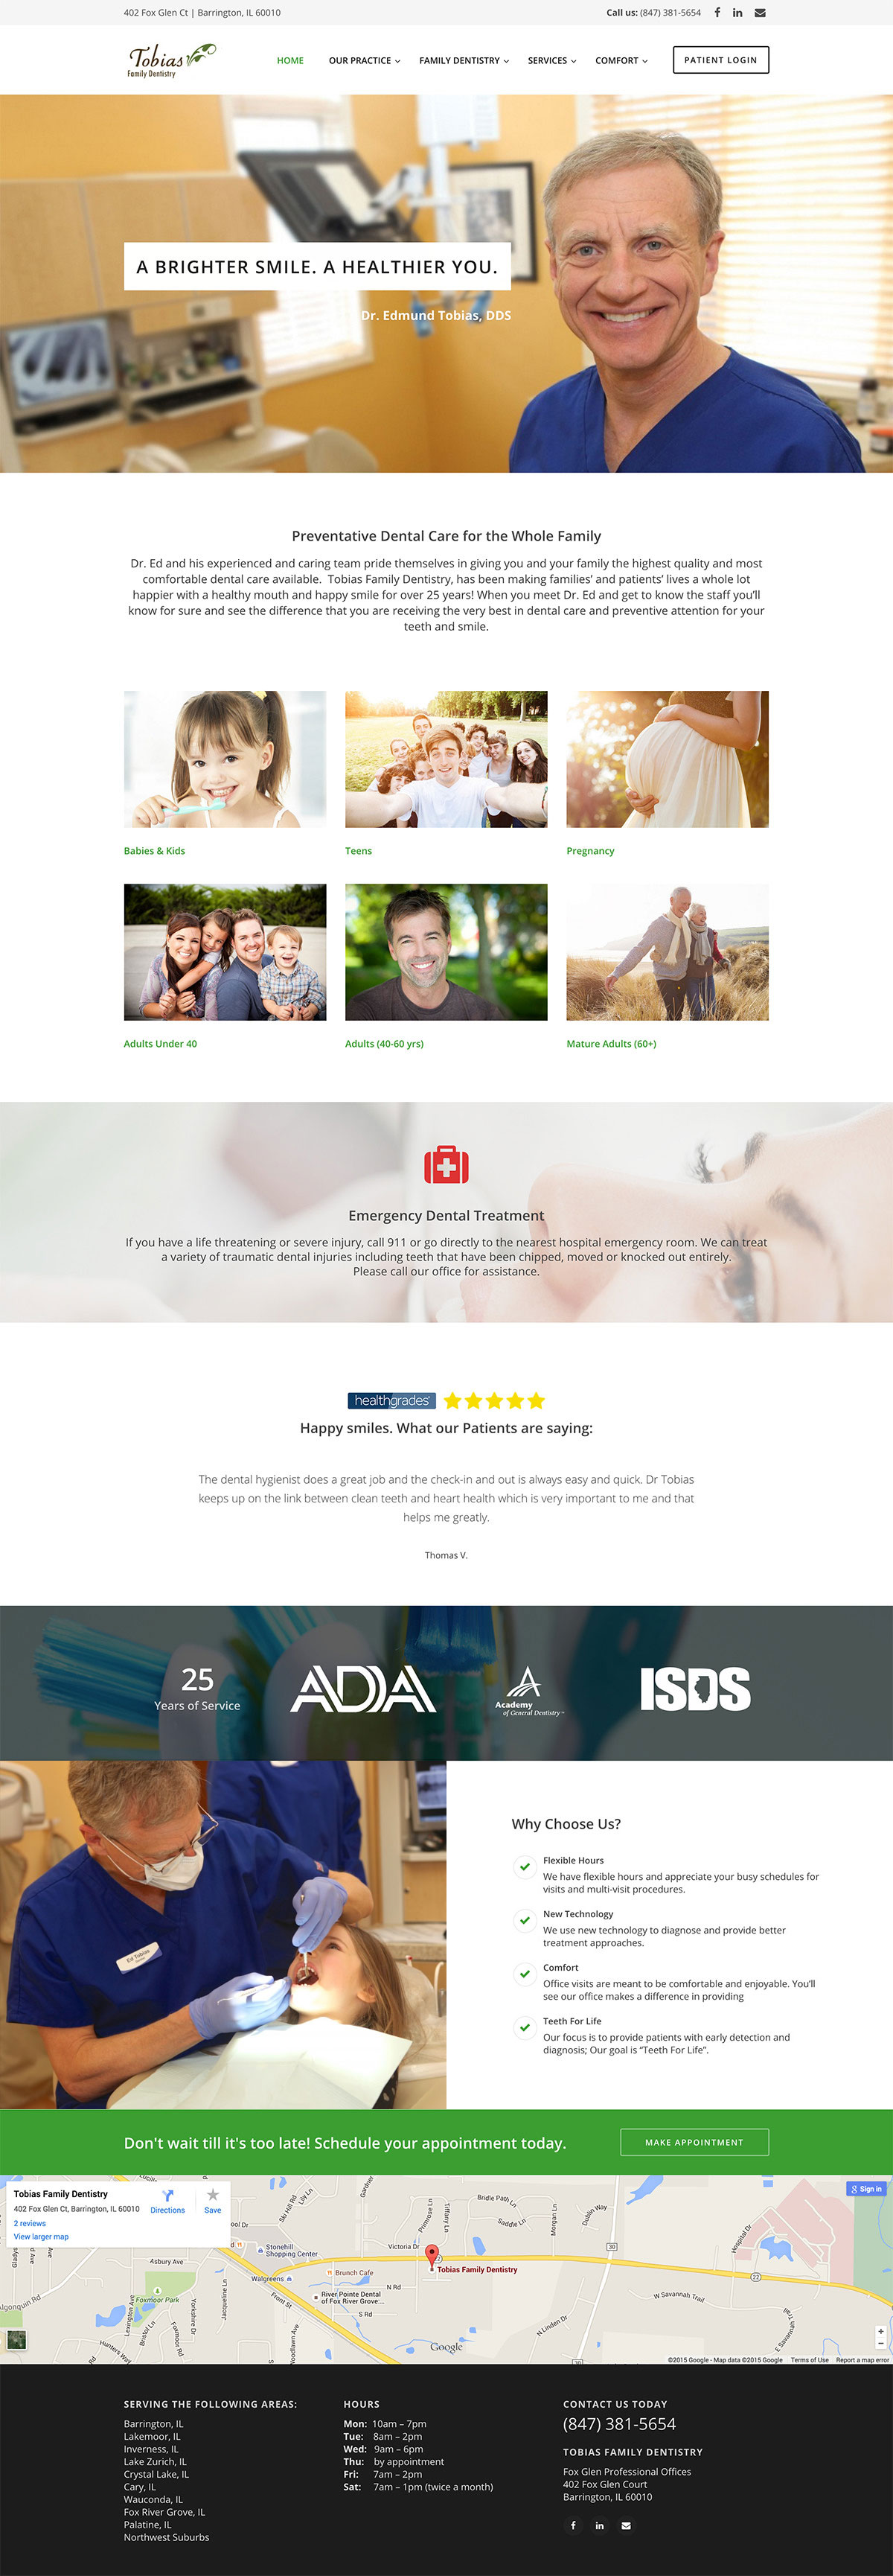 tobias website